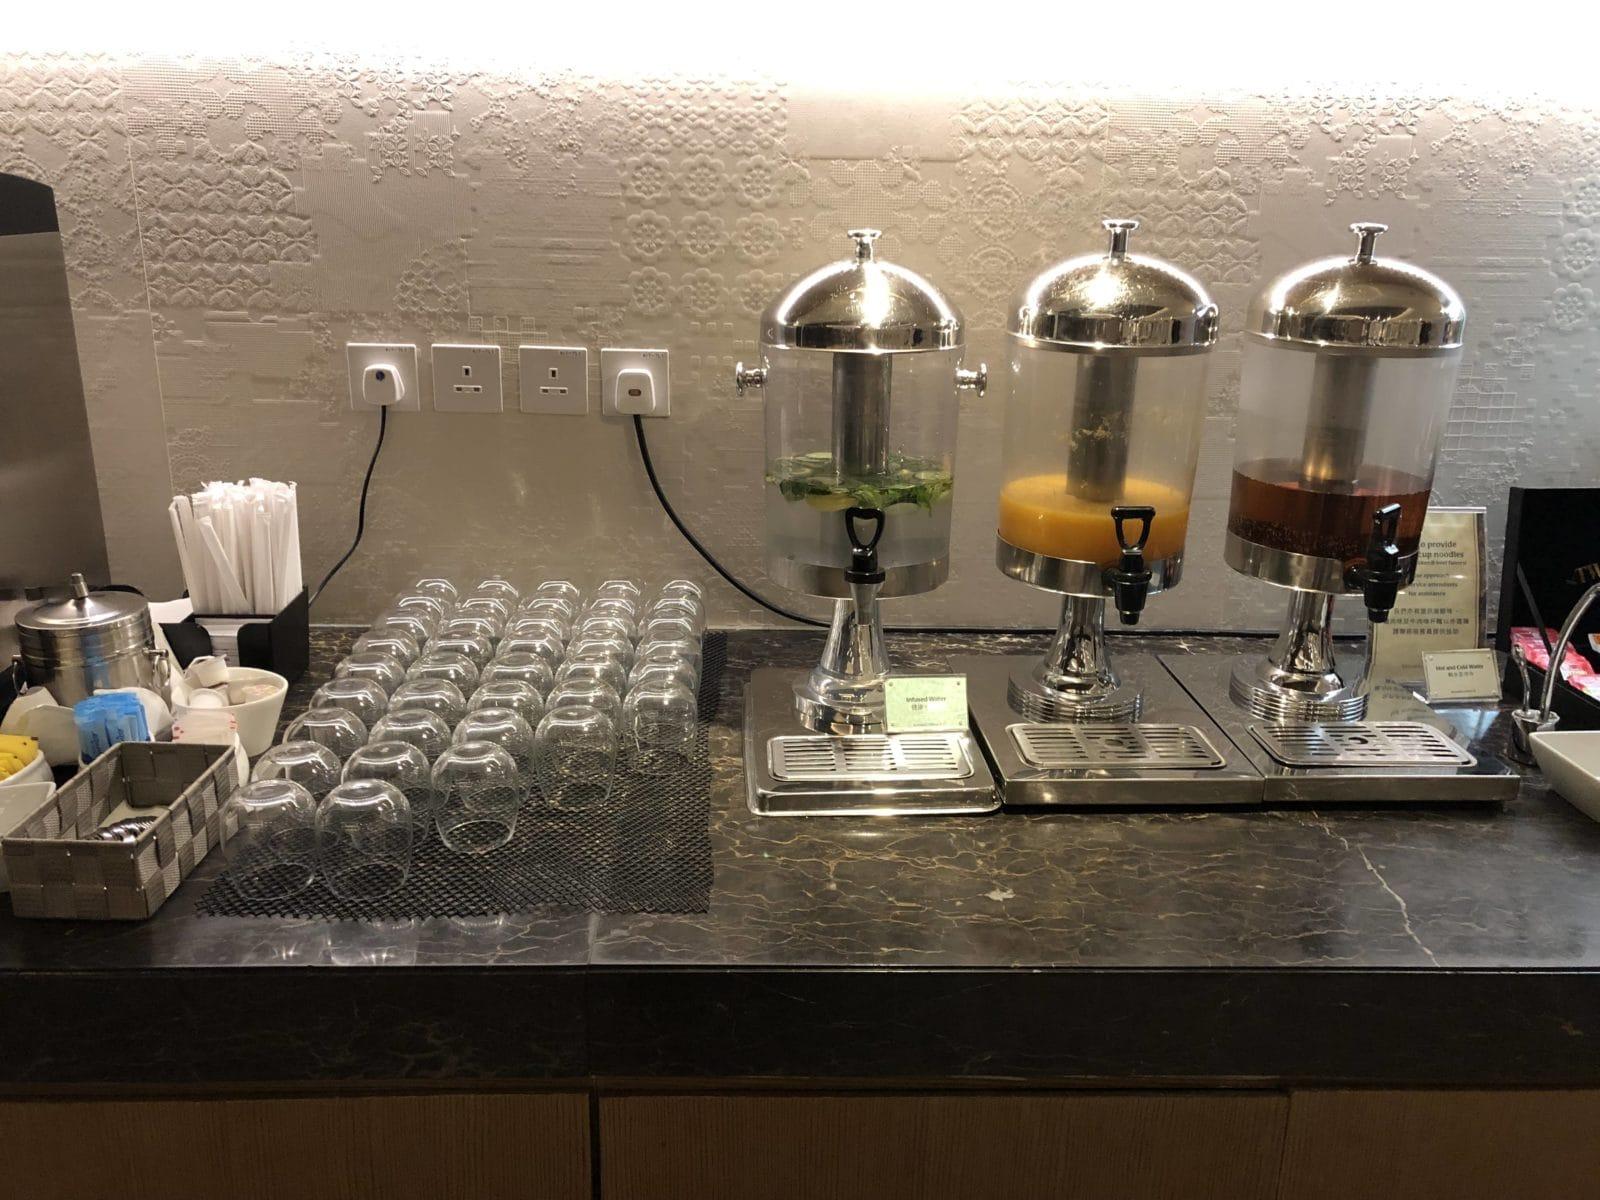 Singapore Airlines SilverKris Lounge Hong Kong Saefte und Wasser mit Geschmack